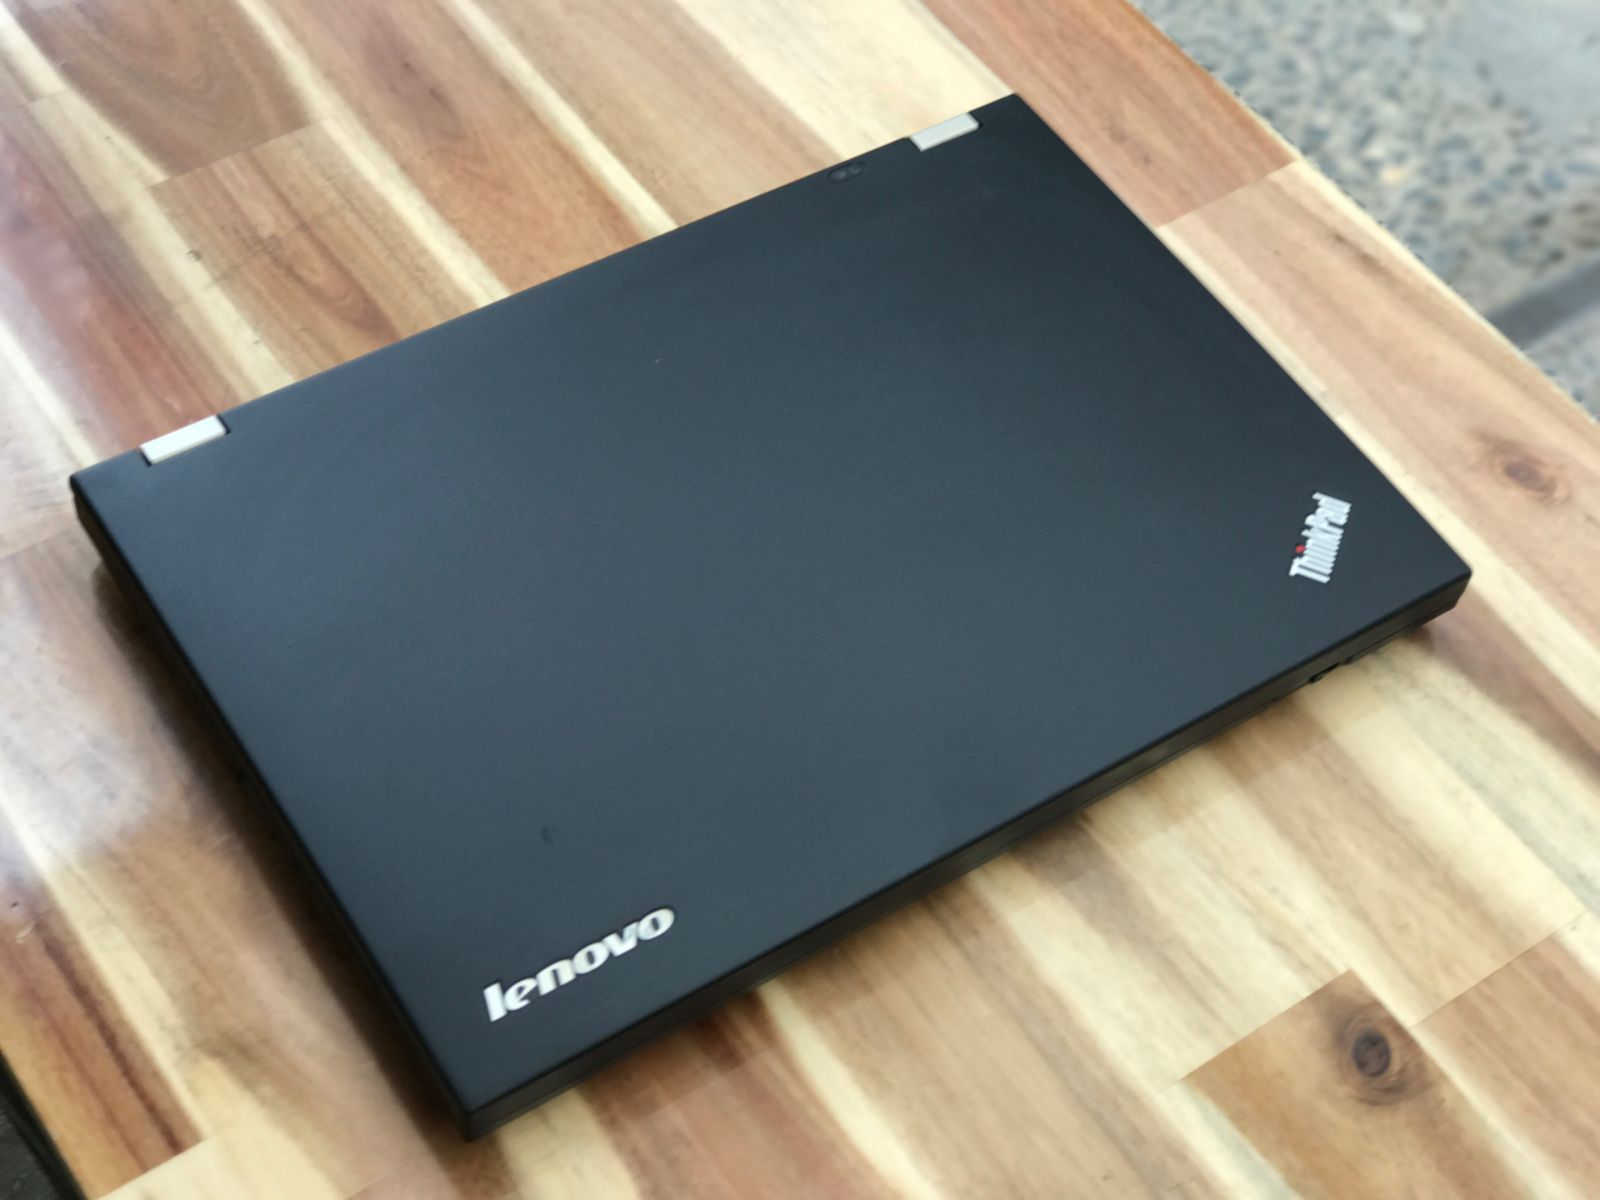 Laptop Lenovo Thinkpad T430, i5 3320M 4G 320G 14inch Đẹp zin 100% Giá - 2